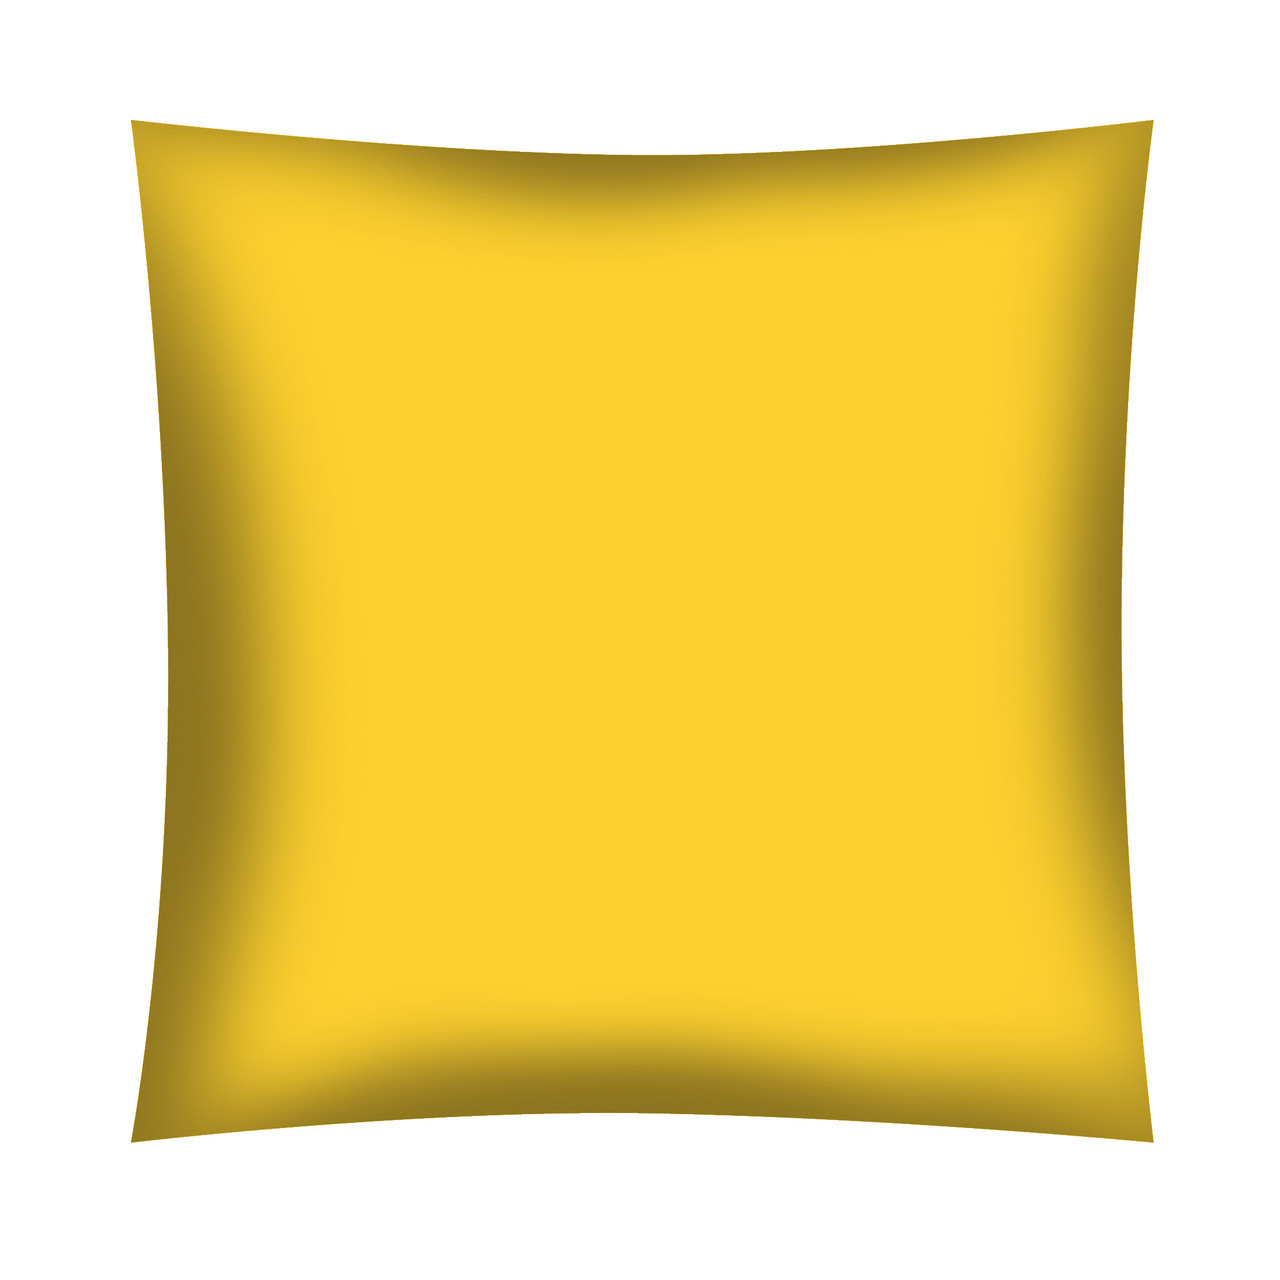 Однотонная Желтая хлопковая ткань